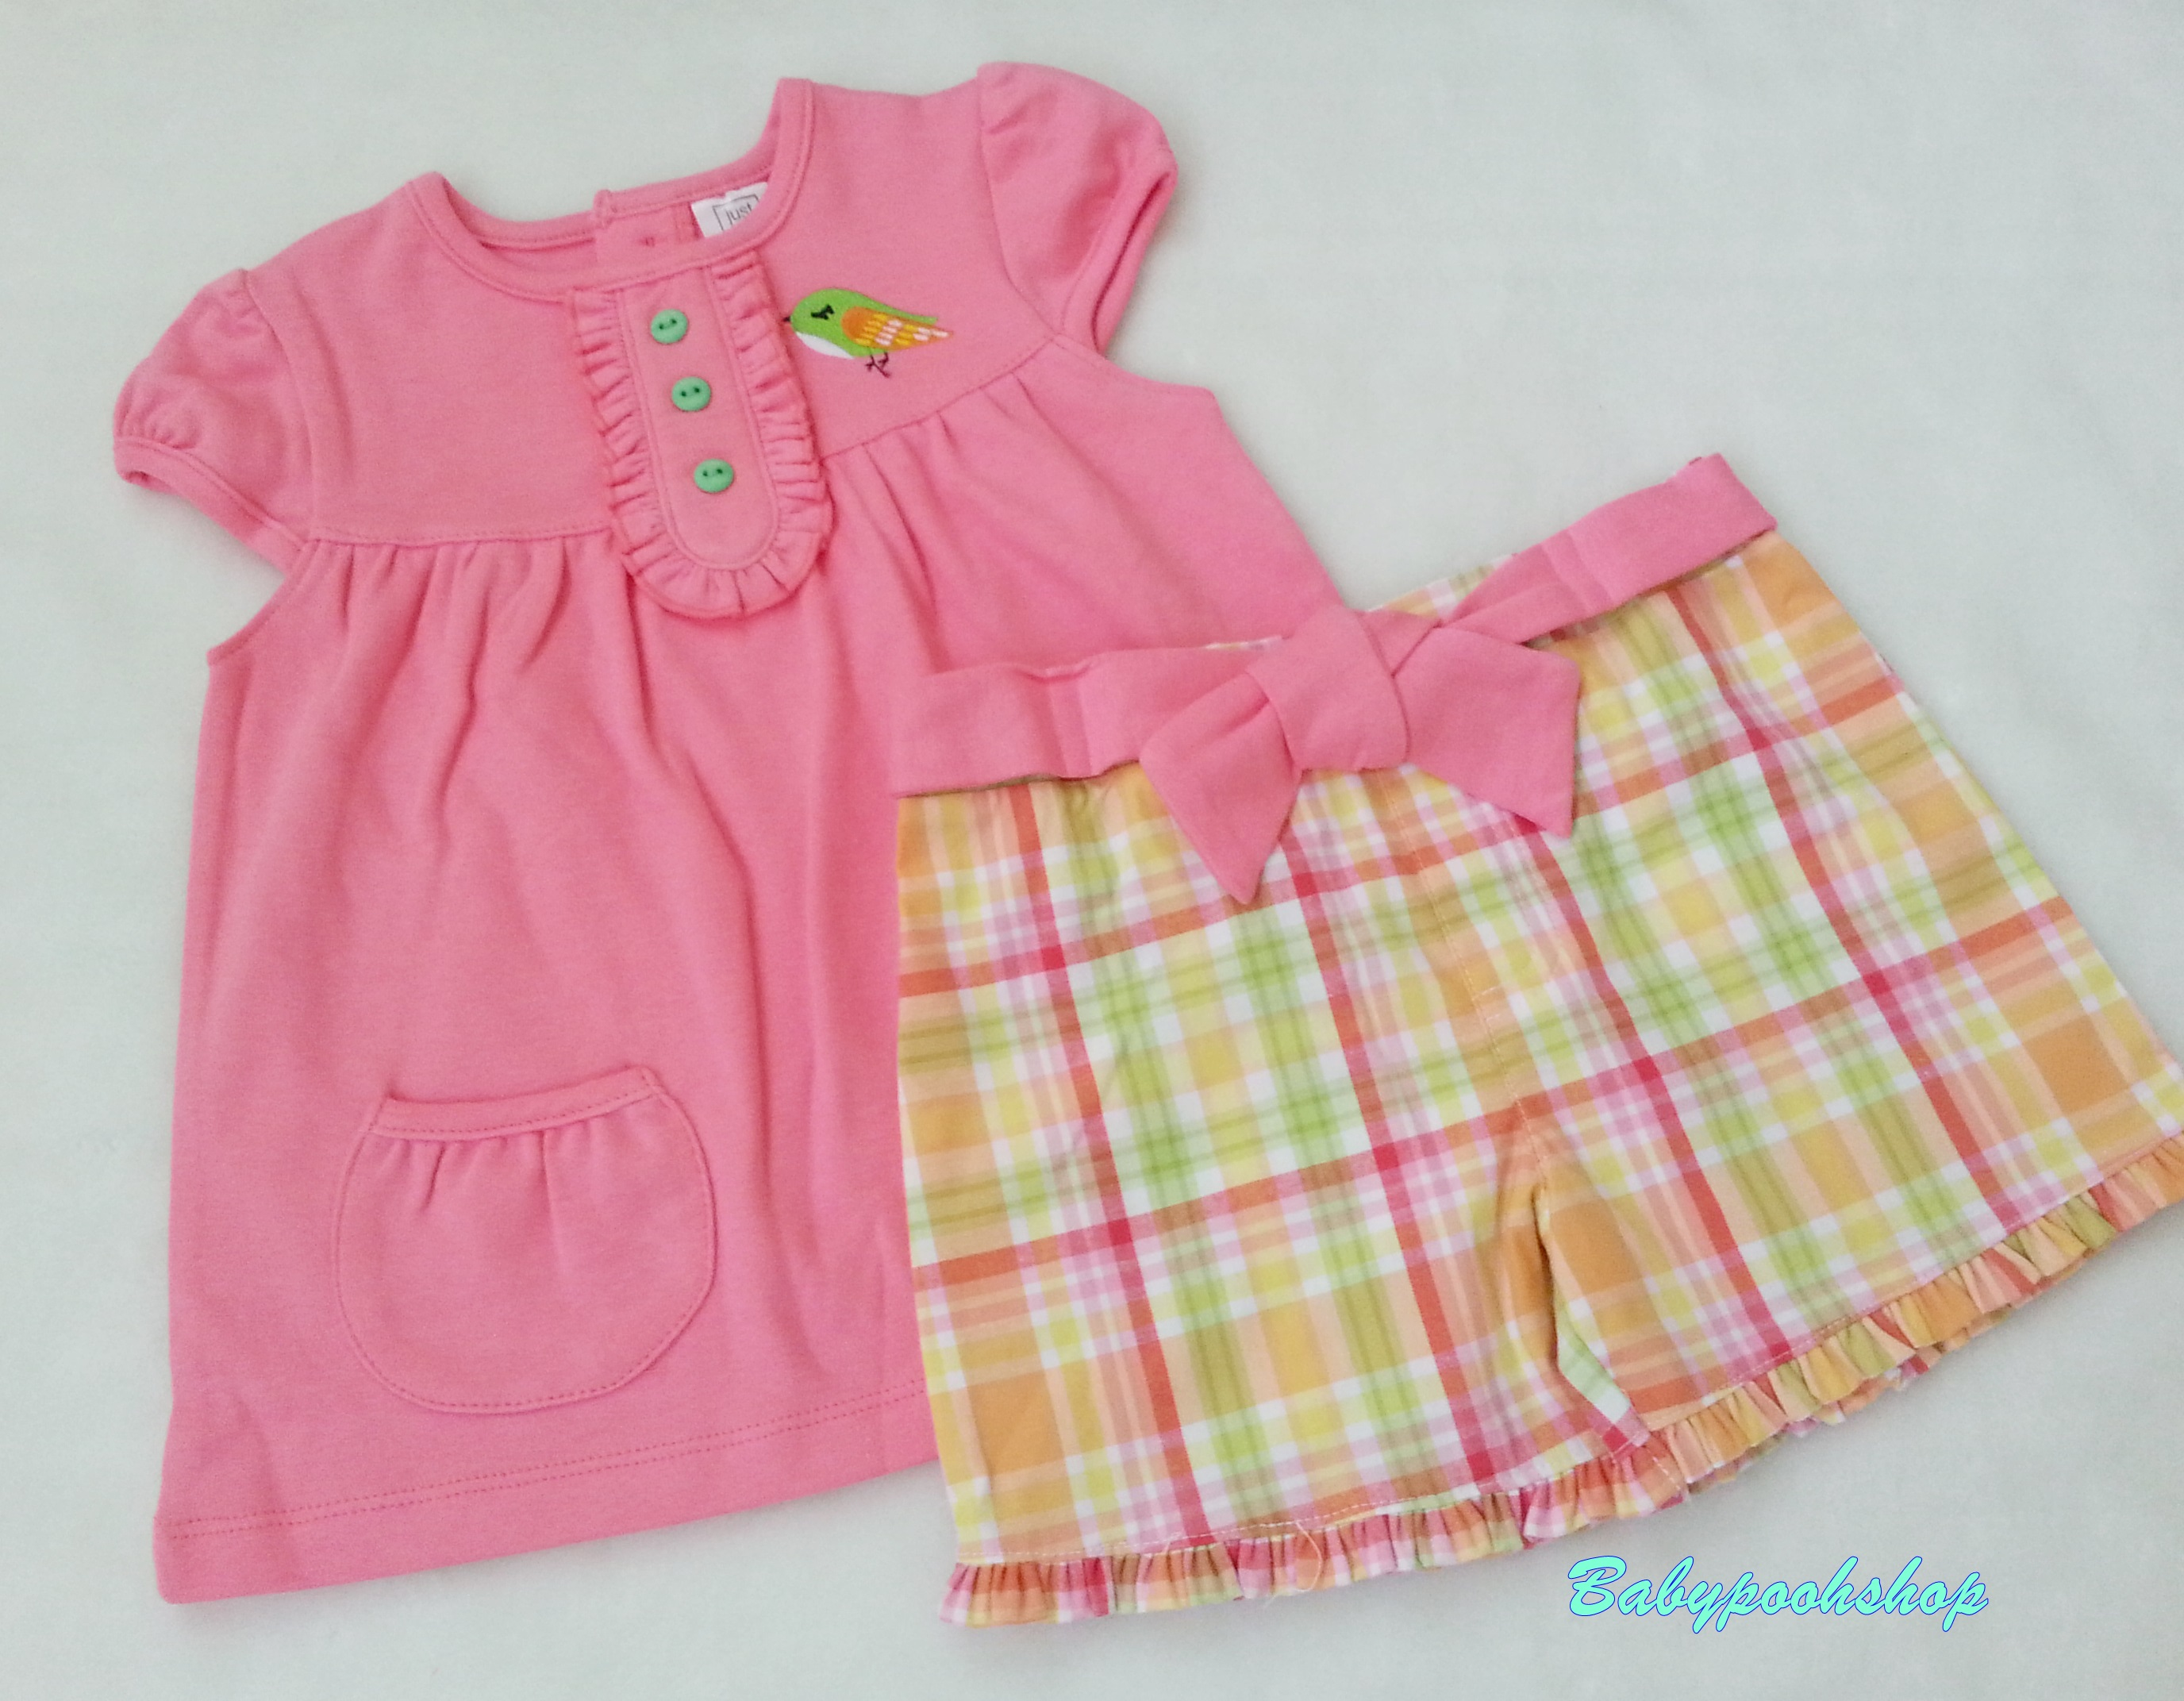 Just one you : เสื้อสีชมพูปักนก มาพร้อม กางเกงขาสั้นลายสก็อต สีเขียว เหลือง size 3T / 4T